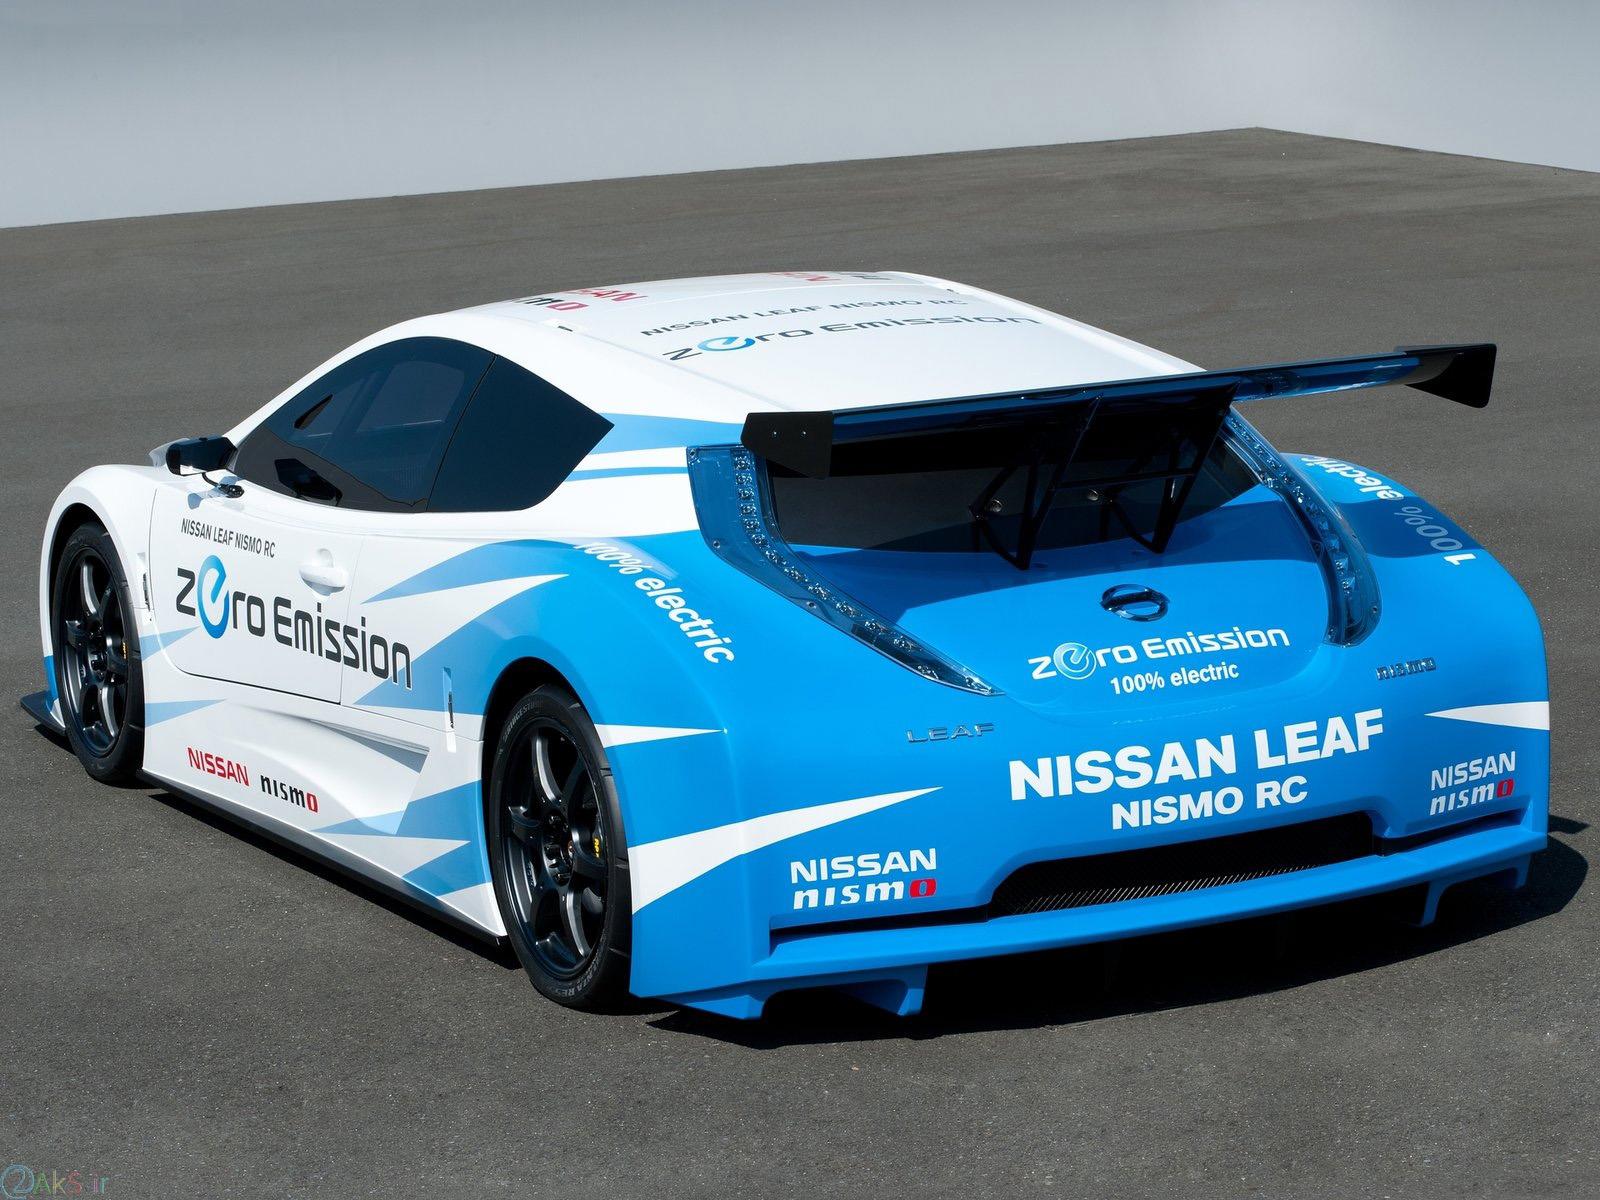 Nissan Leaf Nismo RC Concept